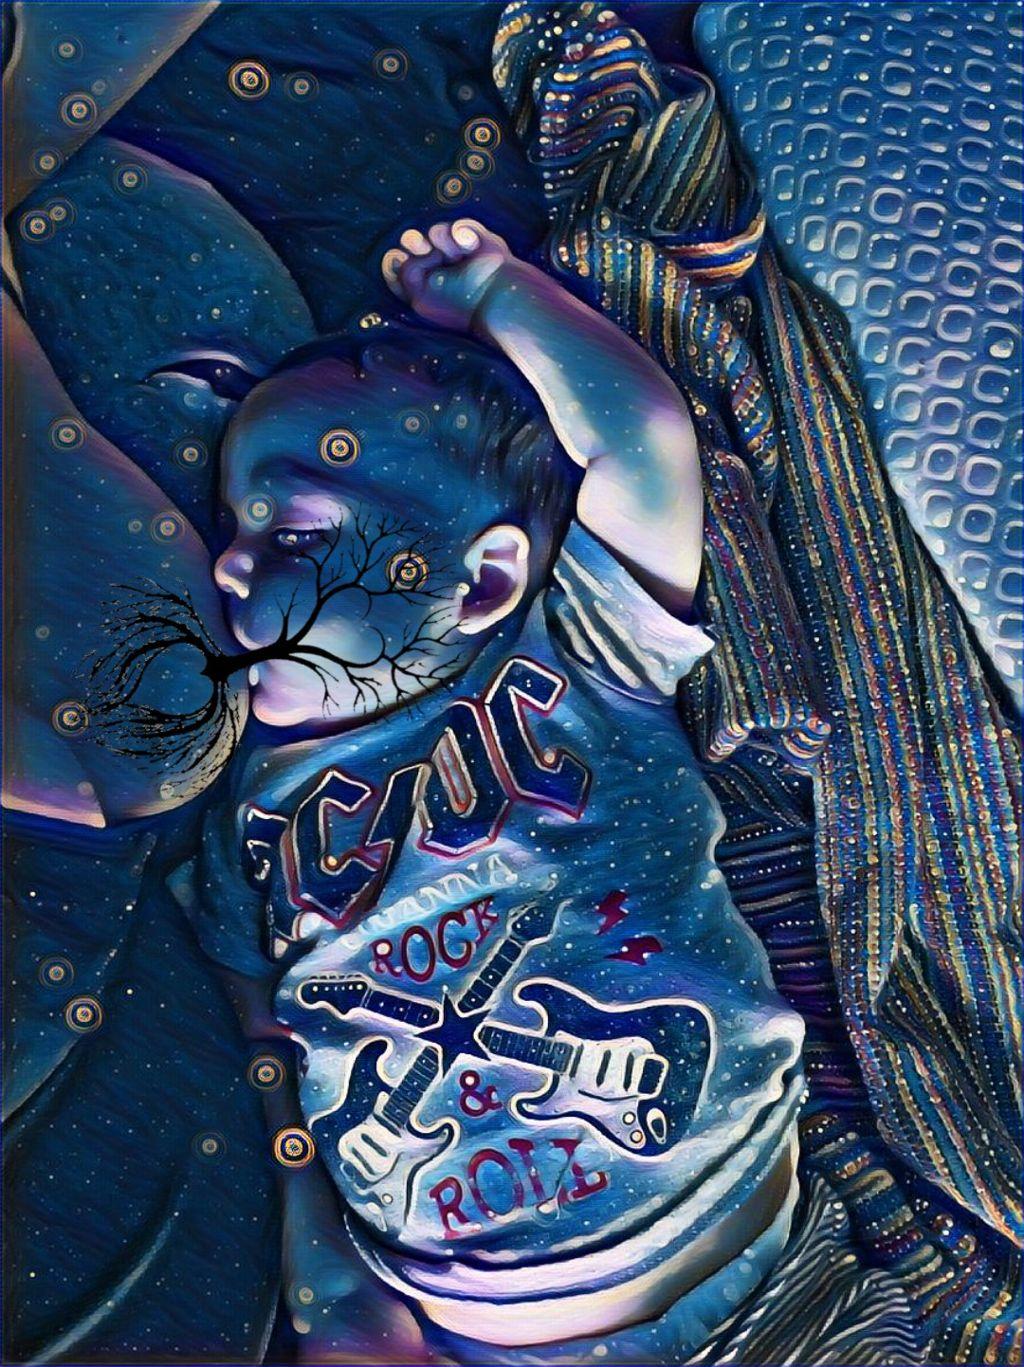 Just 2 weeks shy of hitting our 1yr anniversary of Breastfeeding!!!! #breastfeedingmama #treeoflife #1yrdown1yrmoretogo #yupthatsrightibreastfeedmybaby #mypagemypost #dontlikeitthenfuckoffandunfriendme #igivenoshitsaboutyourignorance #mamaandbabybond #breastfeedingjourney #love #itsnatural #acdc #fistsup #breastfeedingadvocate #oneyearbreastfeeding